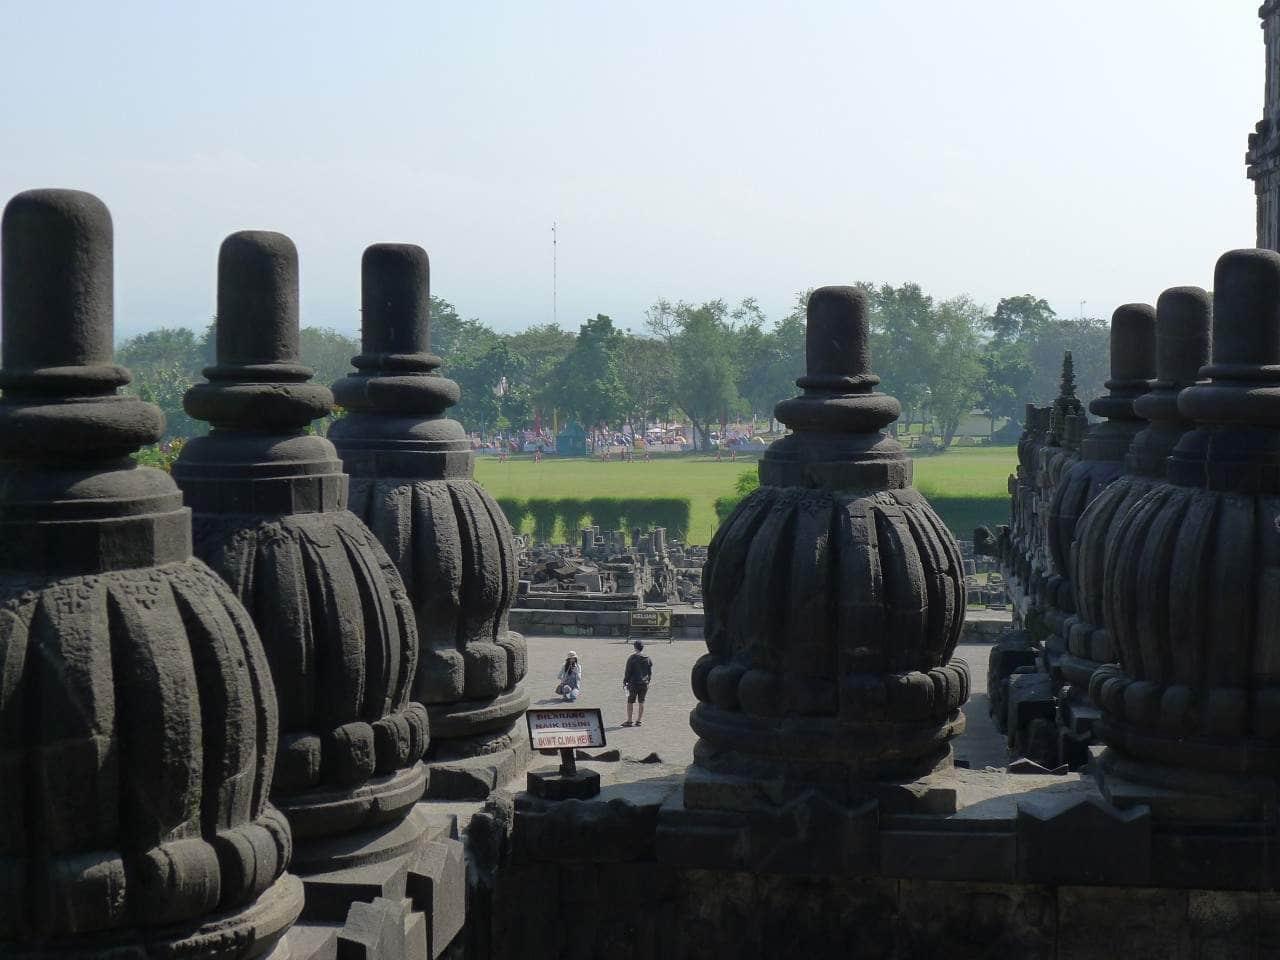 Indonesien - Borobudur Tempel bei Yogyakarta